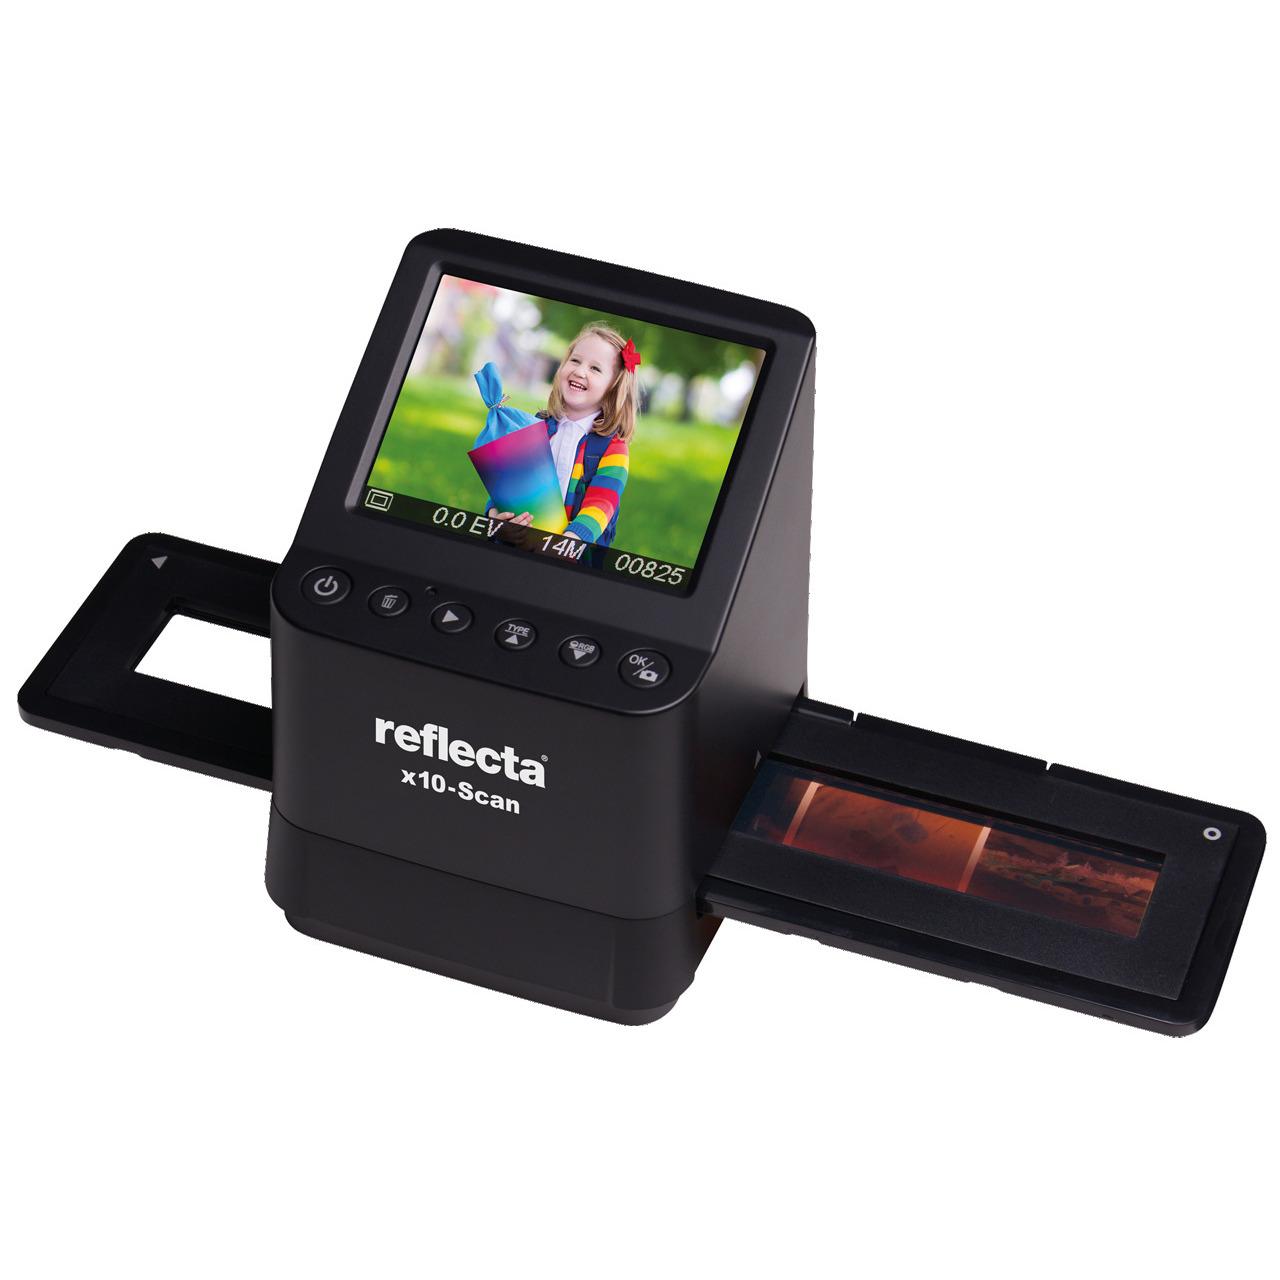 reflecta Dia-Negativscanner x10-Scan- 14 Megapixel- Vorschaudisplay 8-9 cm (3-5undquot )- RGB-Farbanpasung